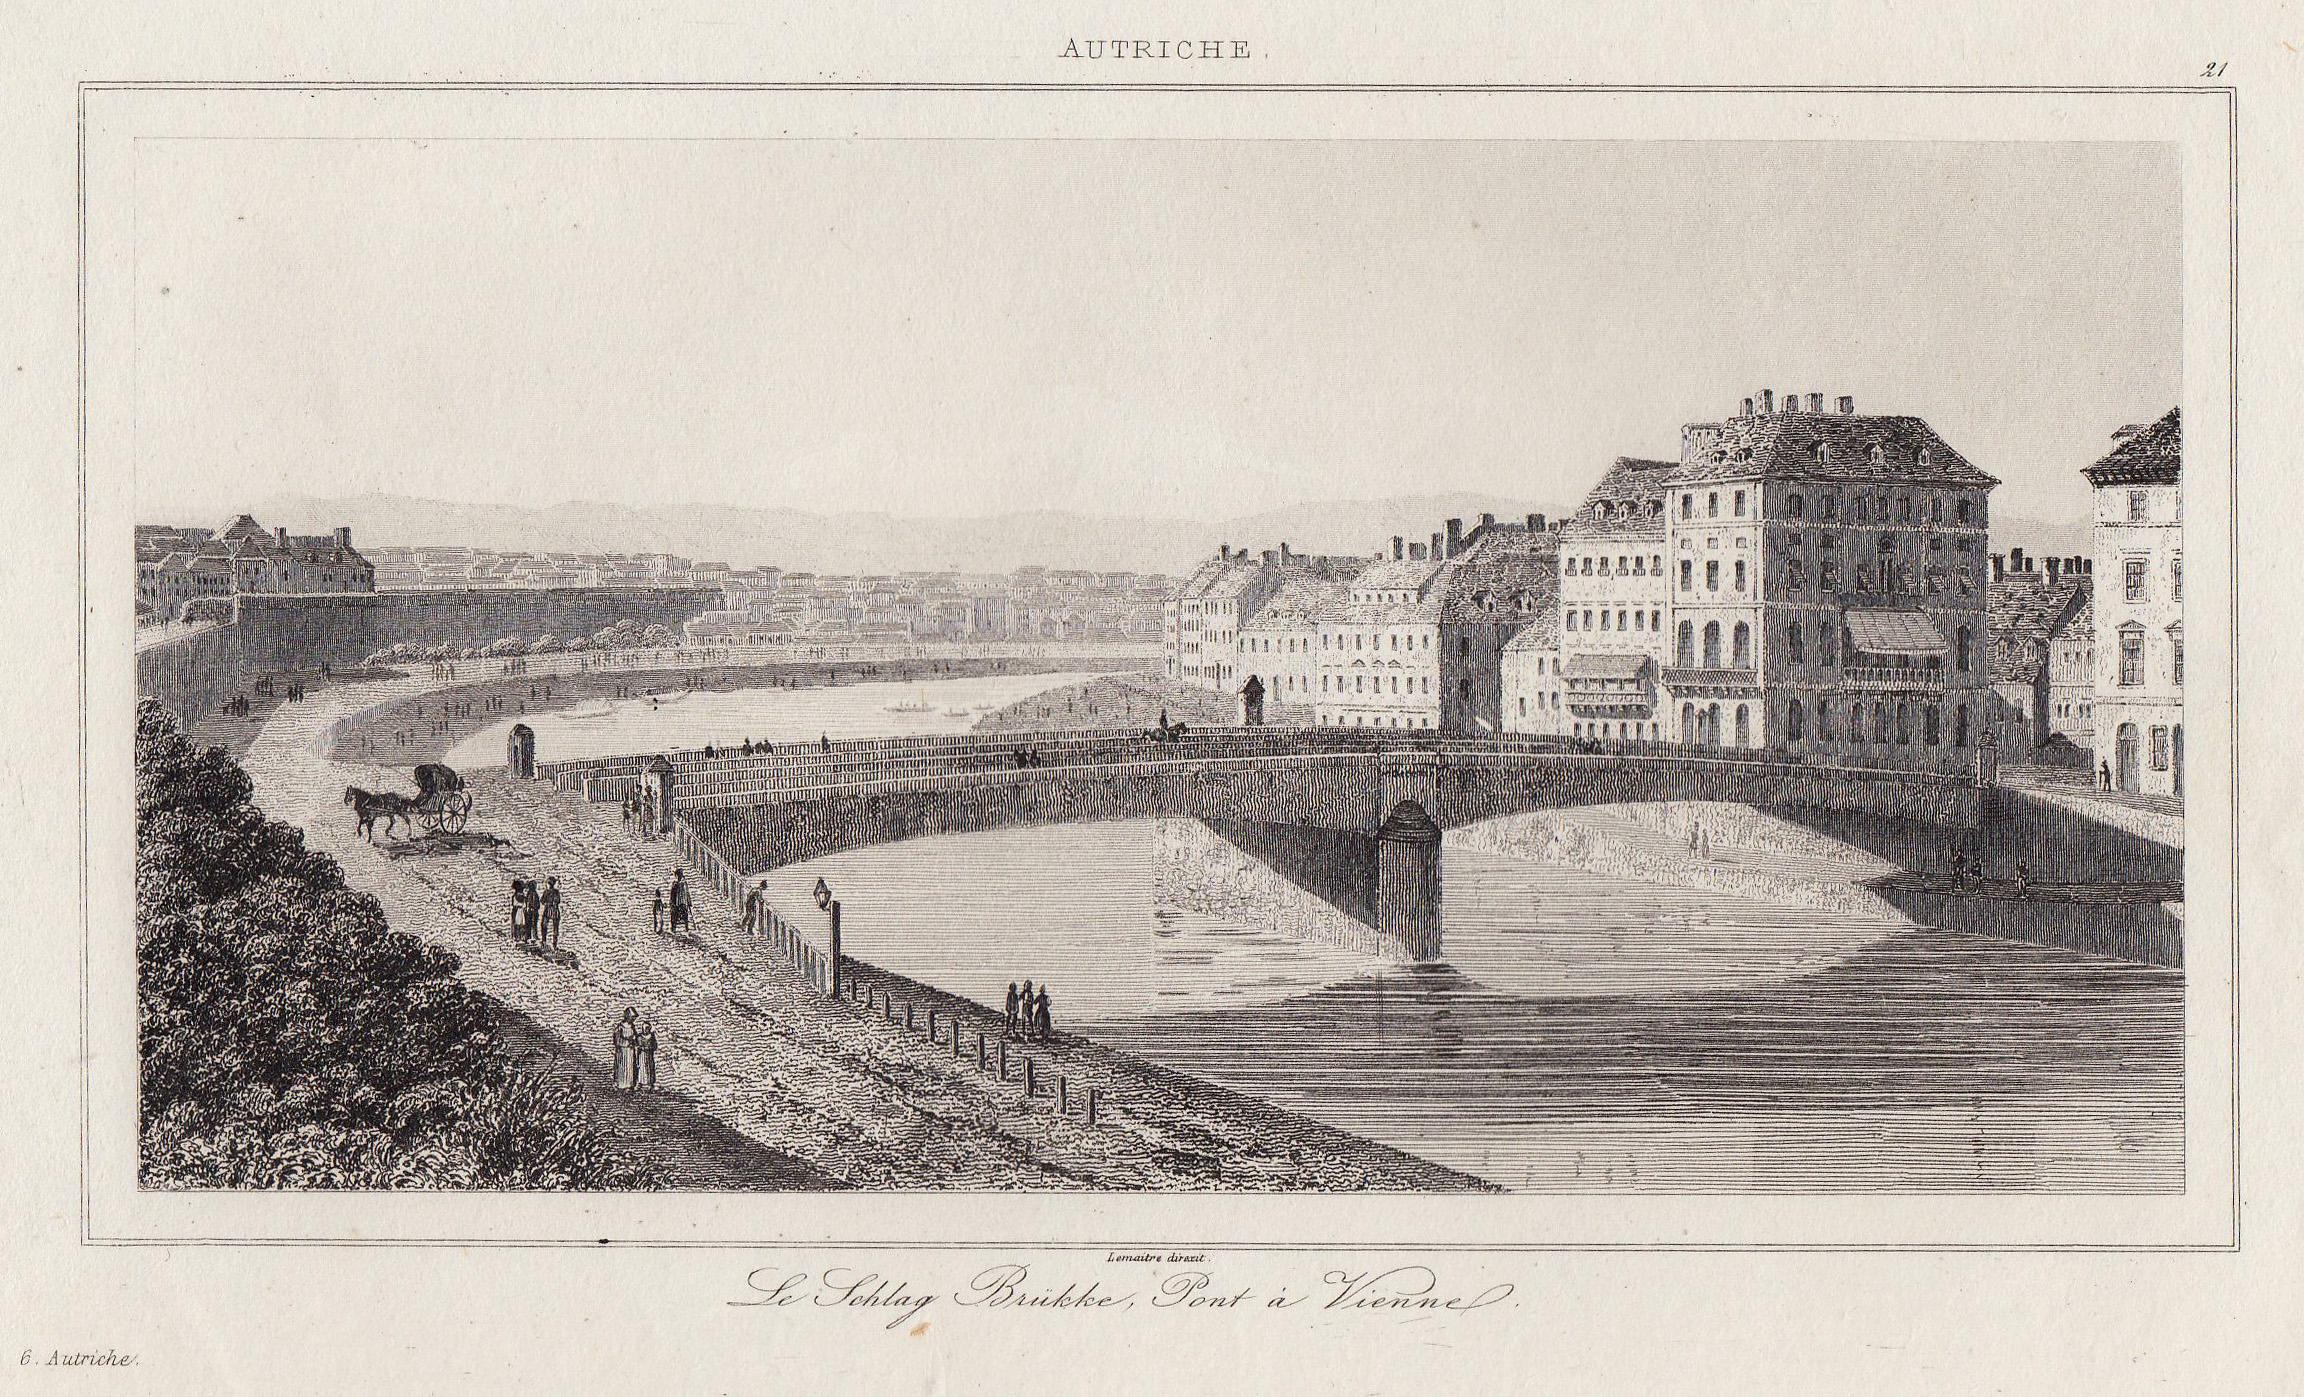 TA., Schwedenbrücke, m. d. Franz Josef Kai,: Wien ( Vienna